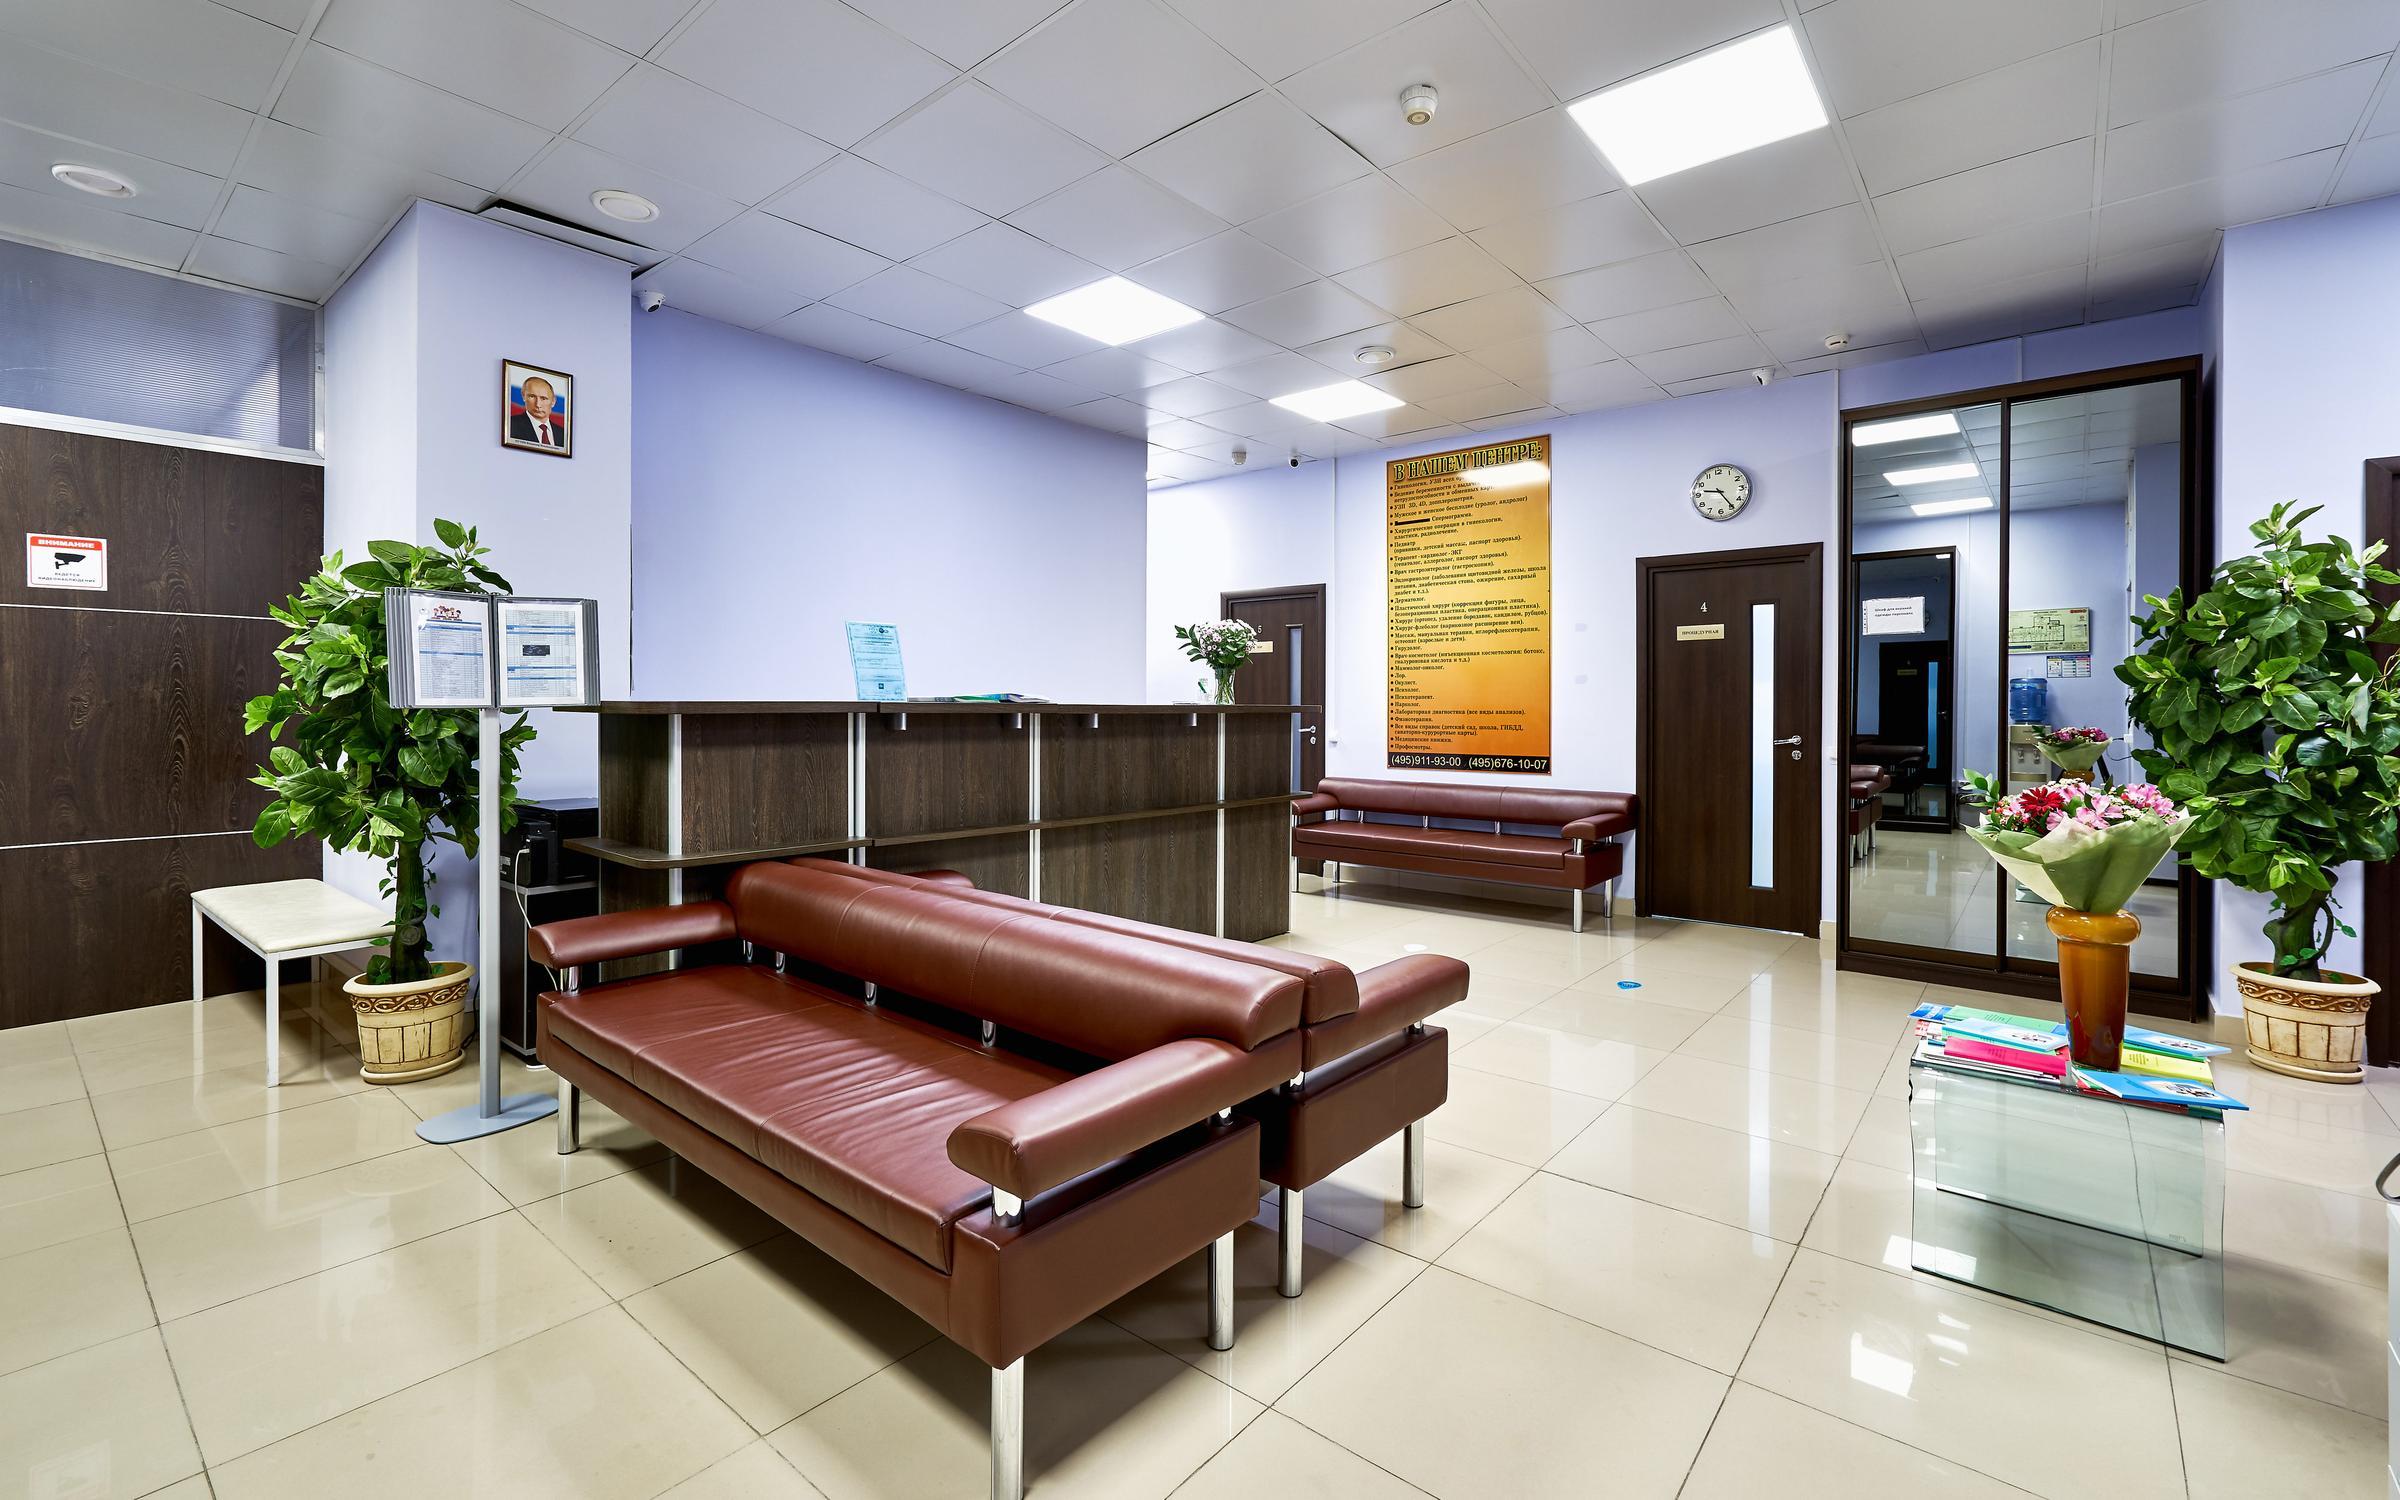 фотография Медицинского центра Медицина Плюс на метро Пролетарская